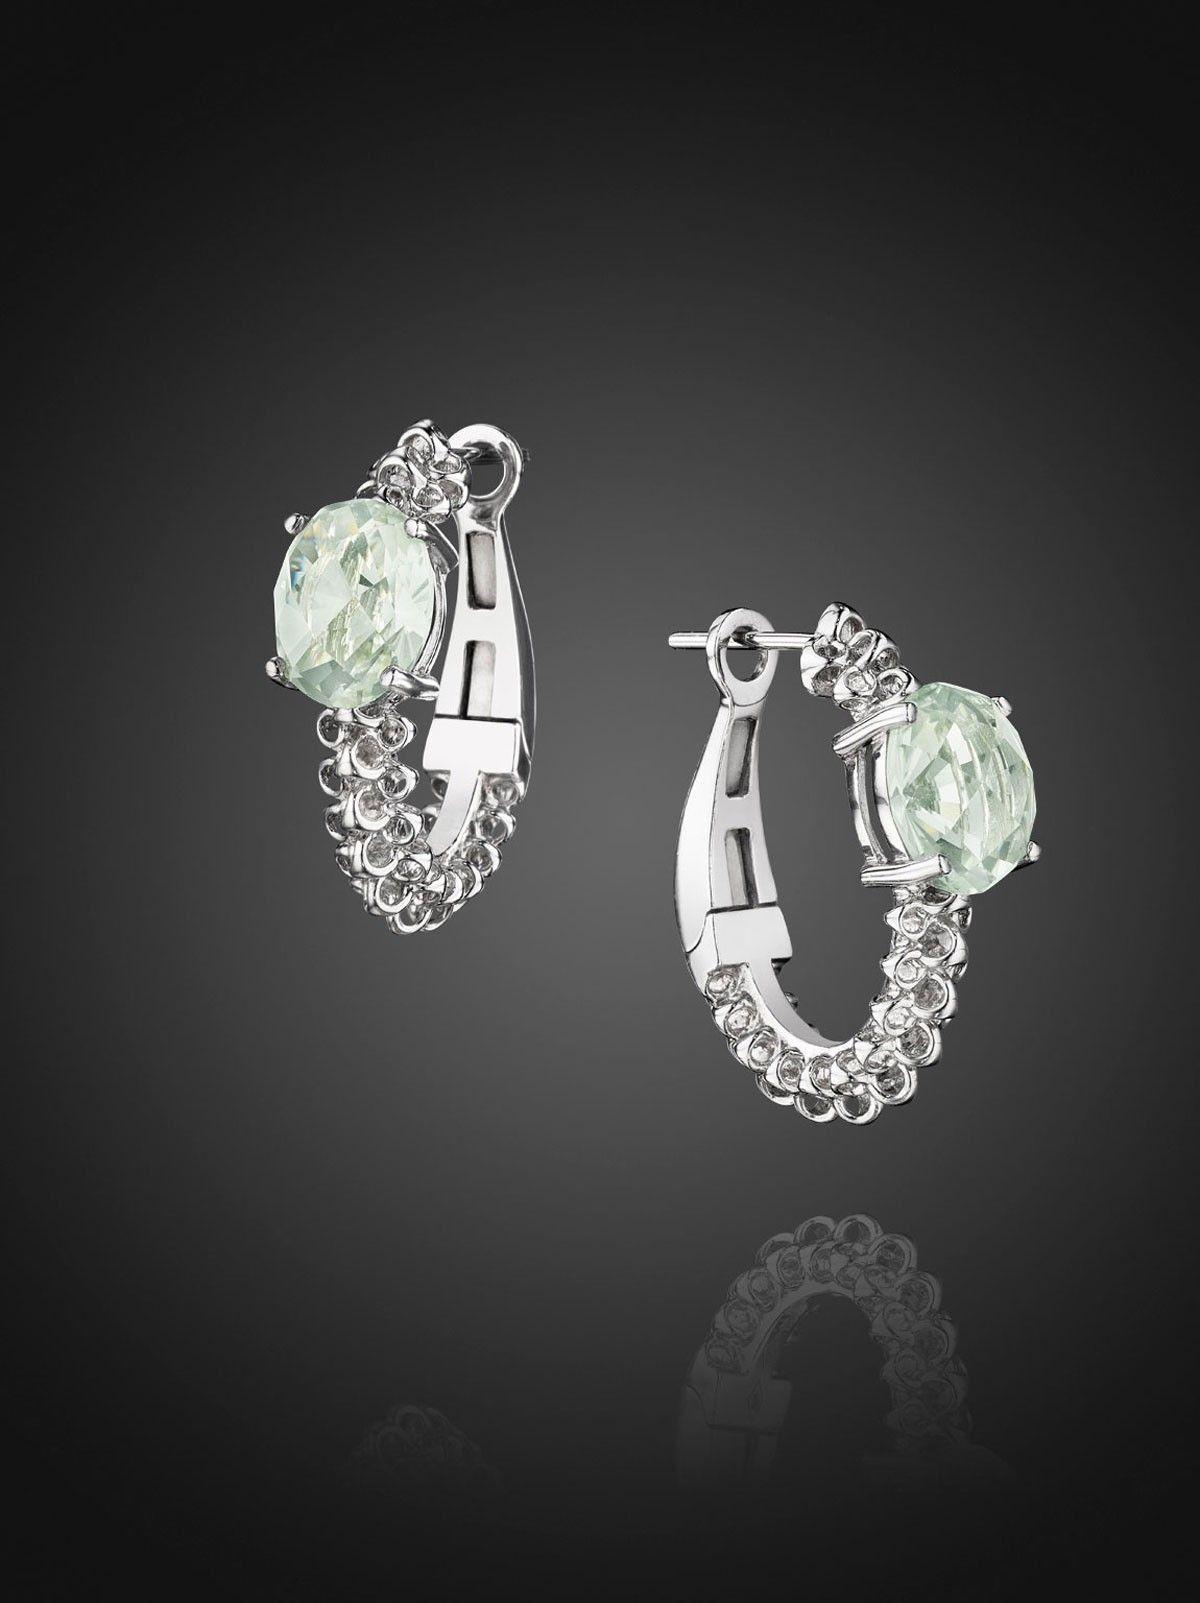 Di Modolo Eternity Medium J Hoop Earrings With Green Amethyst In Sterling Silver